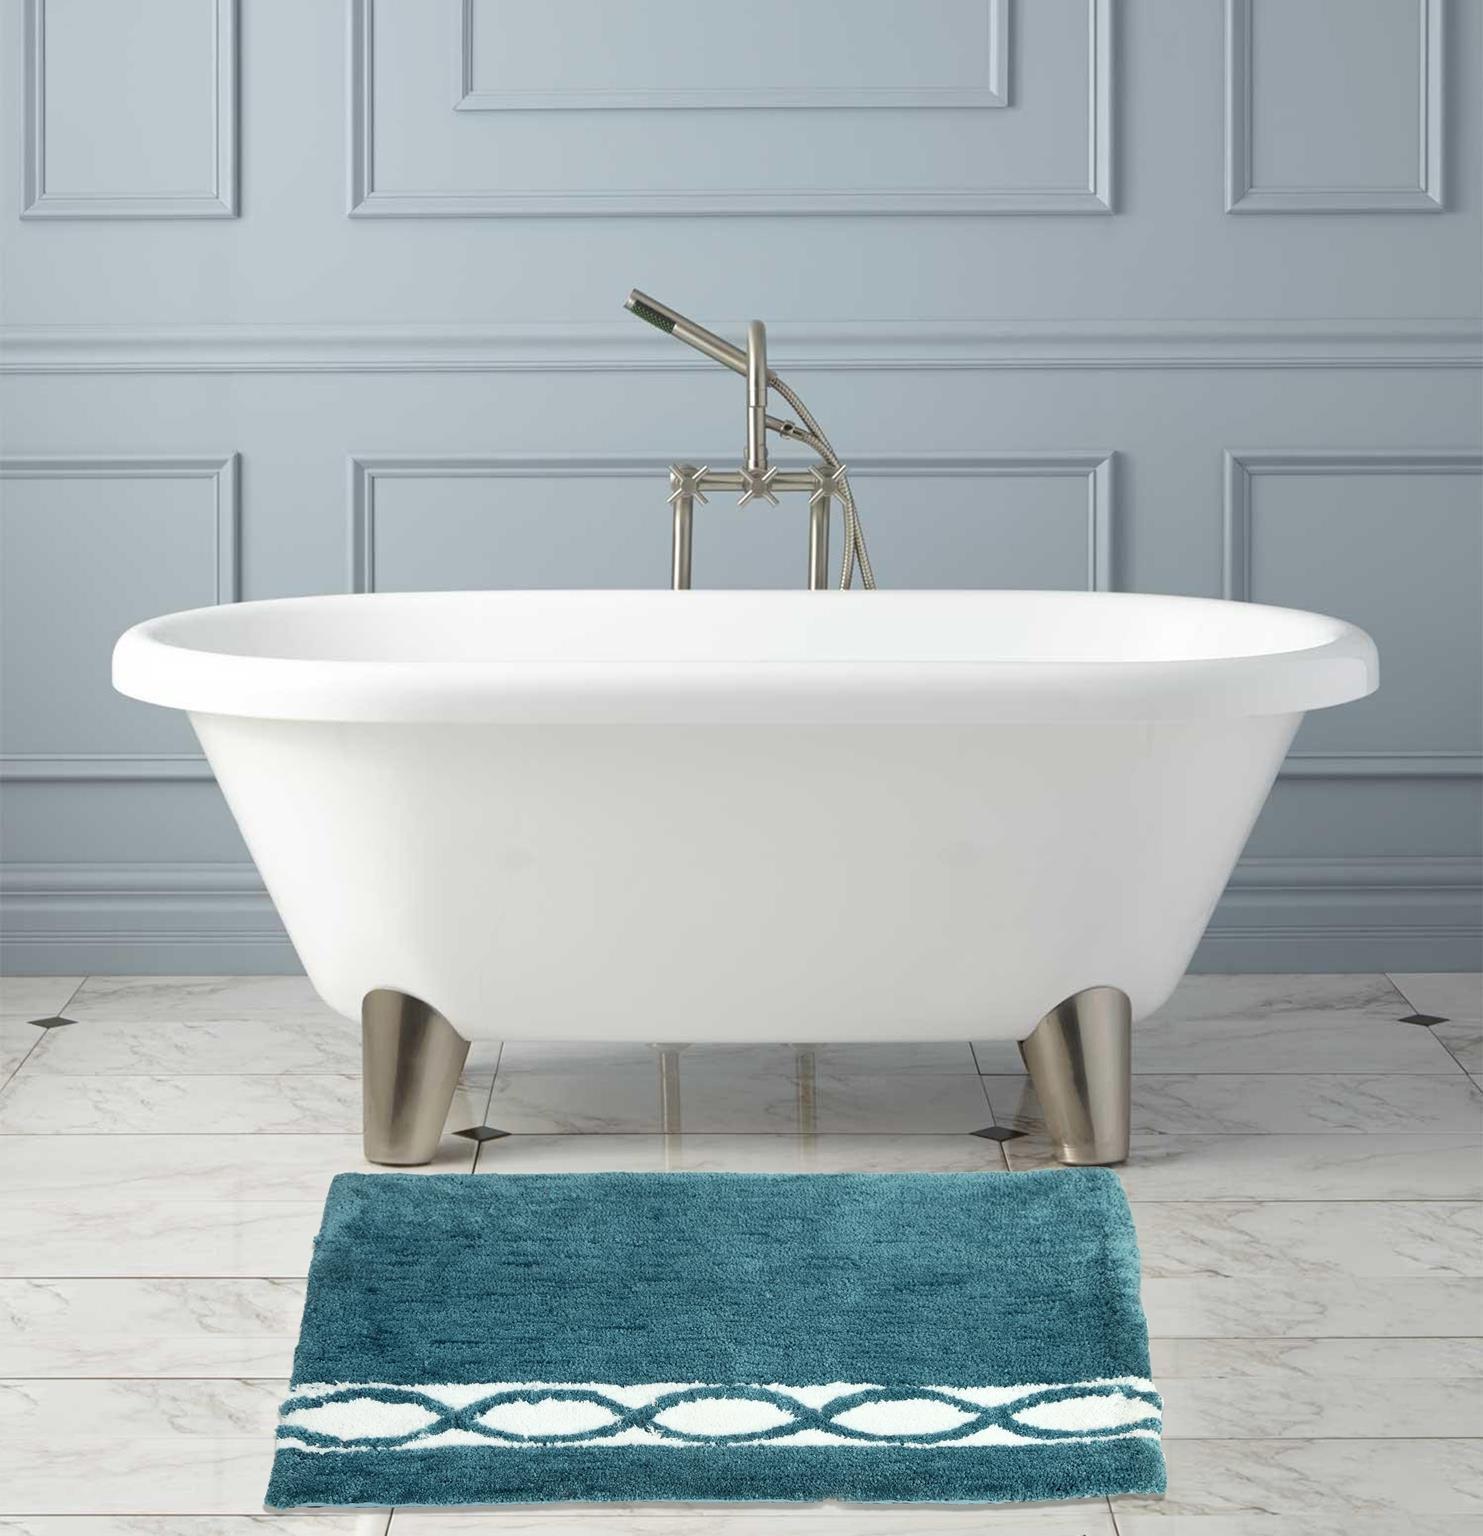 WARISI - Wave Collection - microfiber Area, Bedroom Bathroom Rug, 34 x 21 inches (Aqua Blue White)